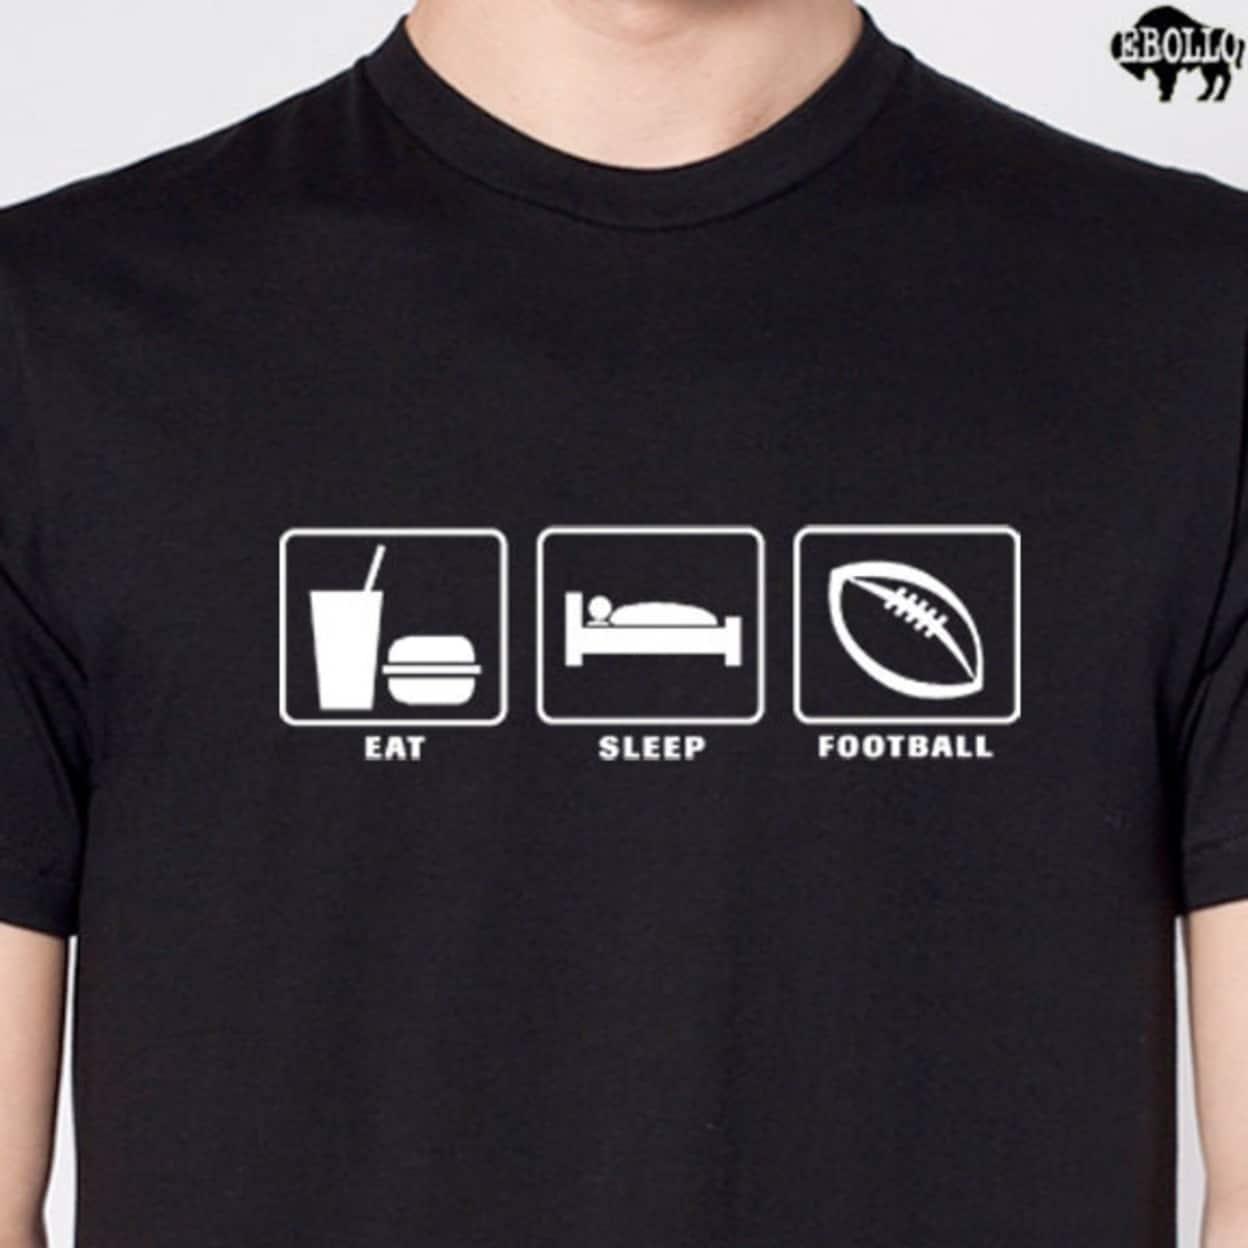 Shop Eat Sleep Football Mens Cool T Shirt Design Funny Tees Sports